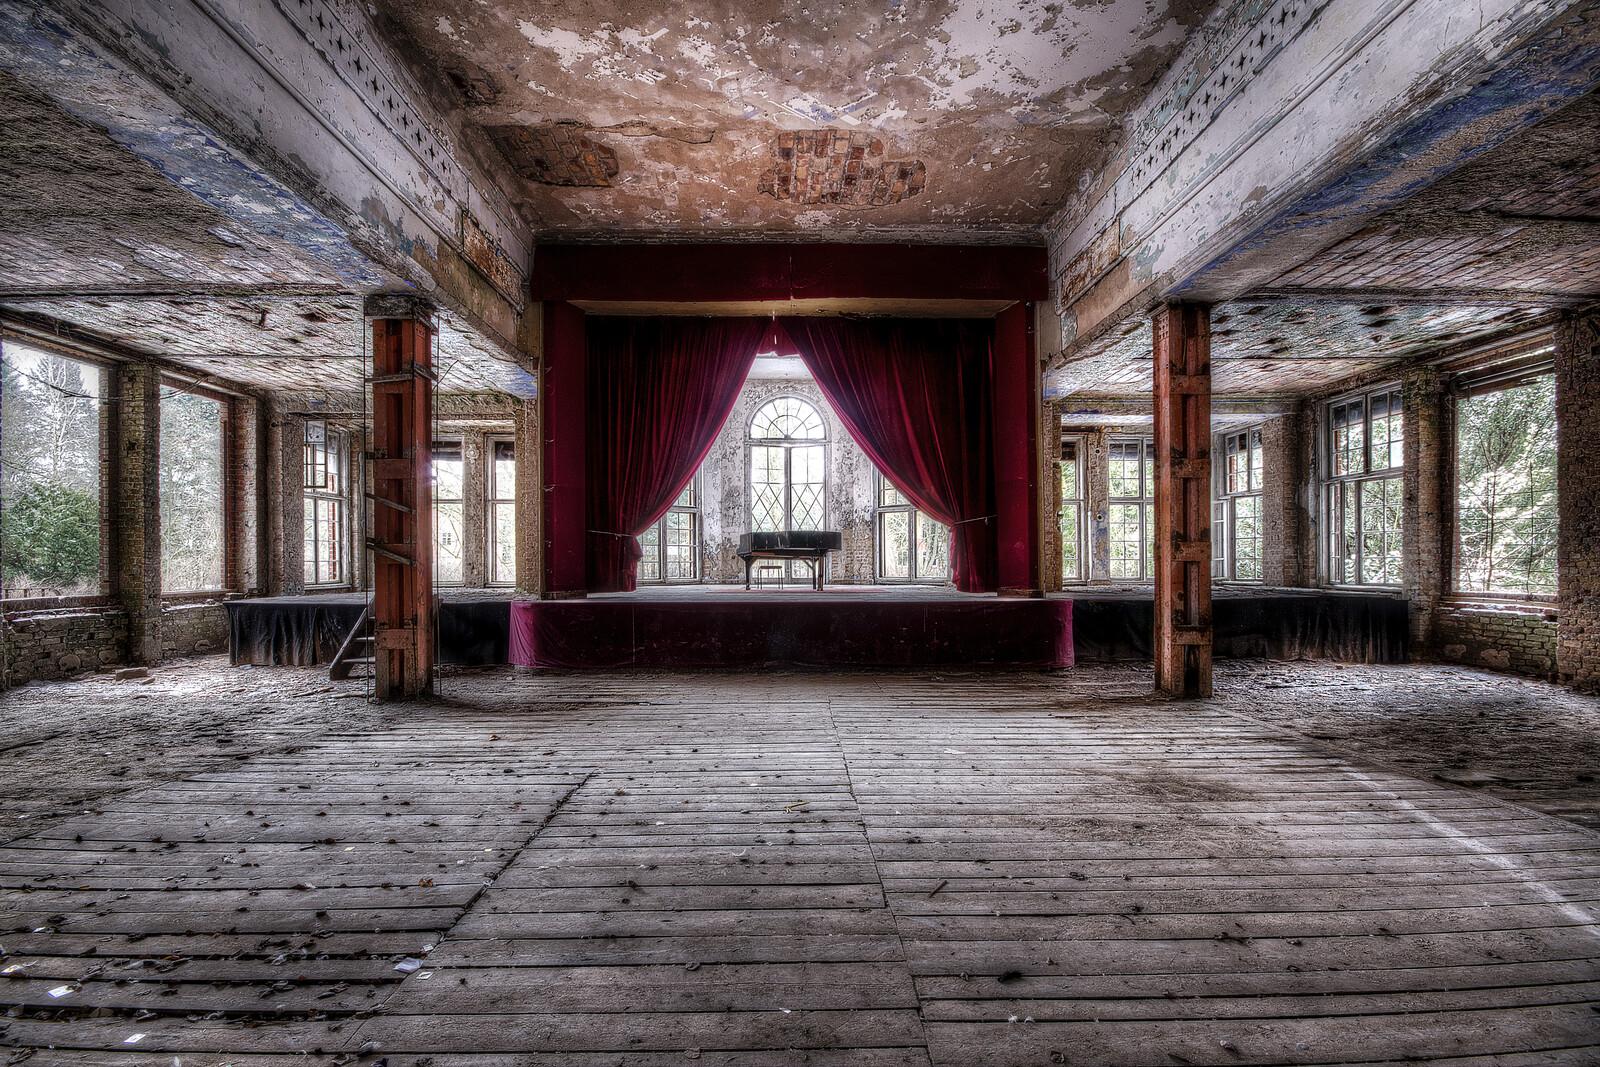 The Final Curtain - Roman & Anna Küffner